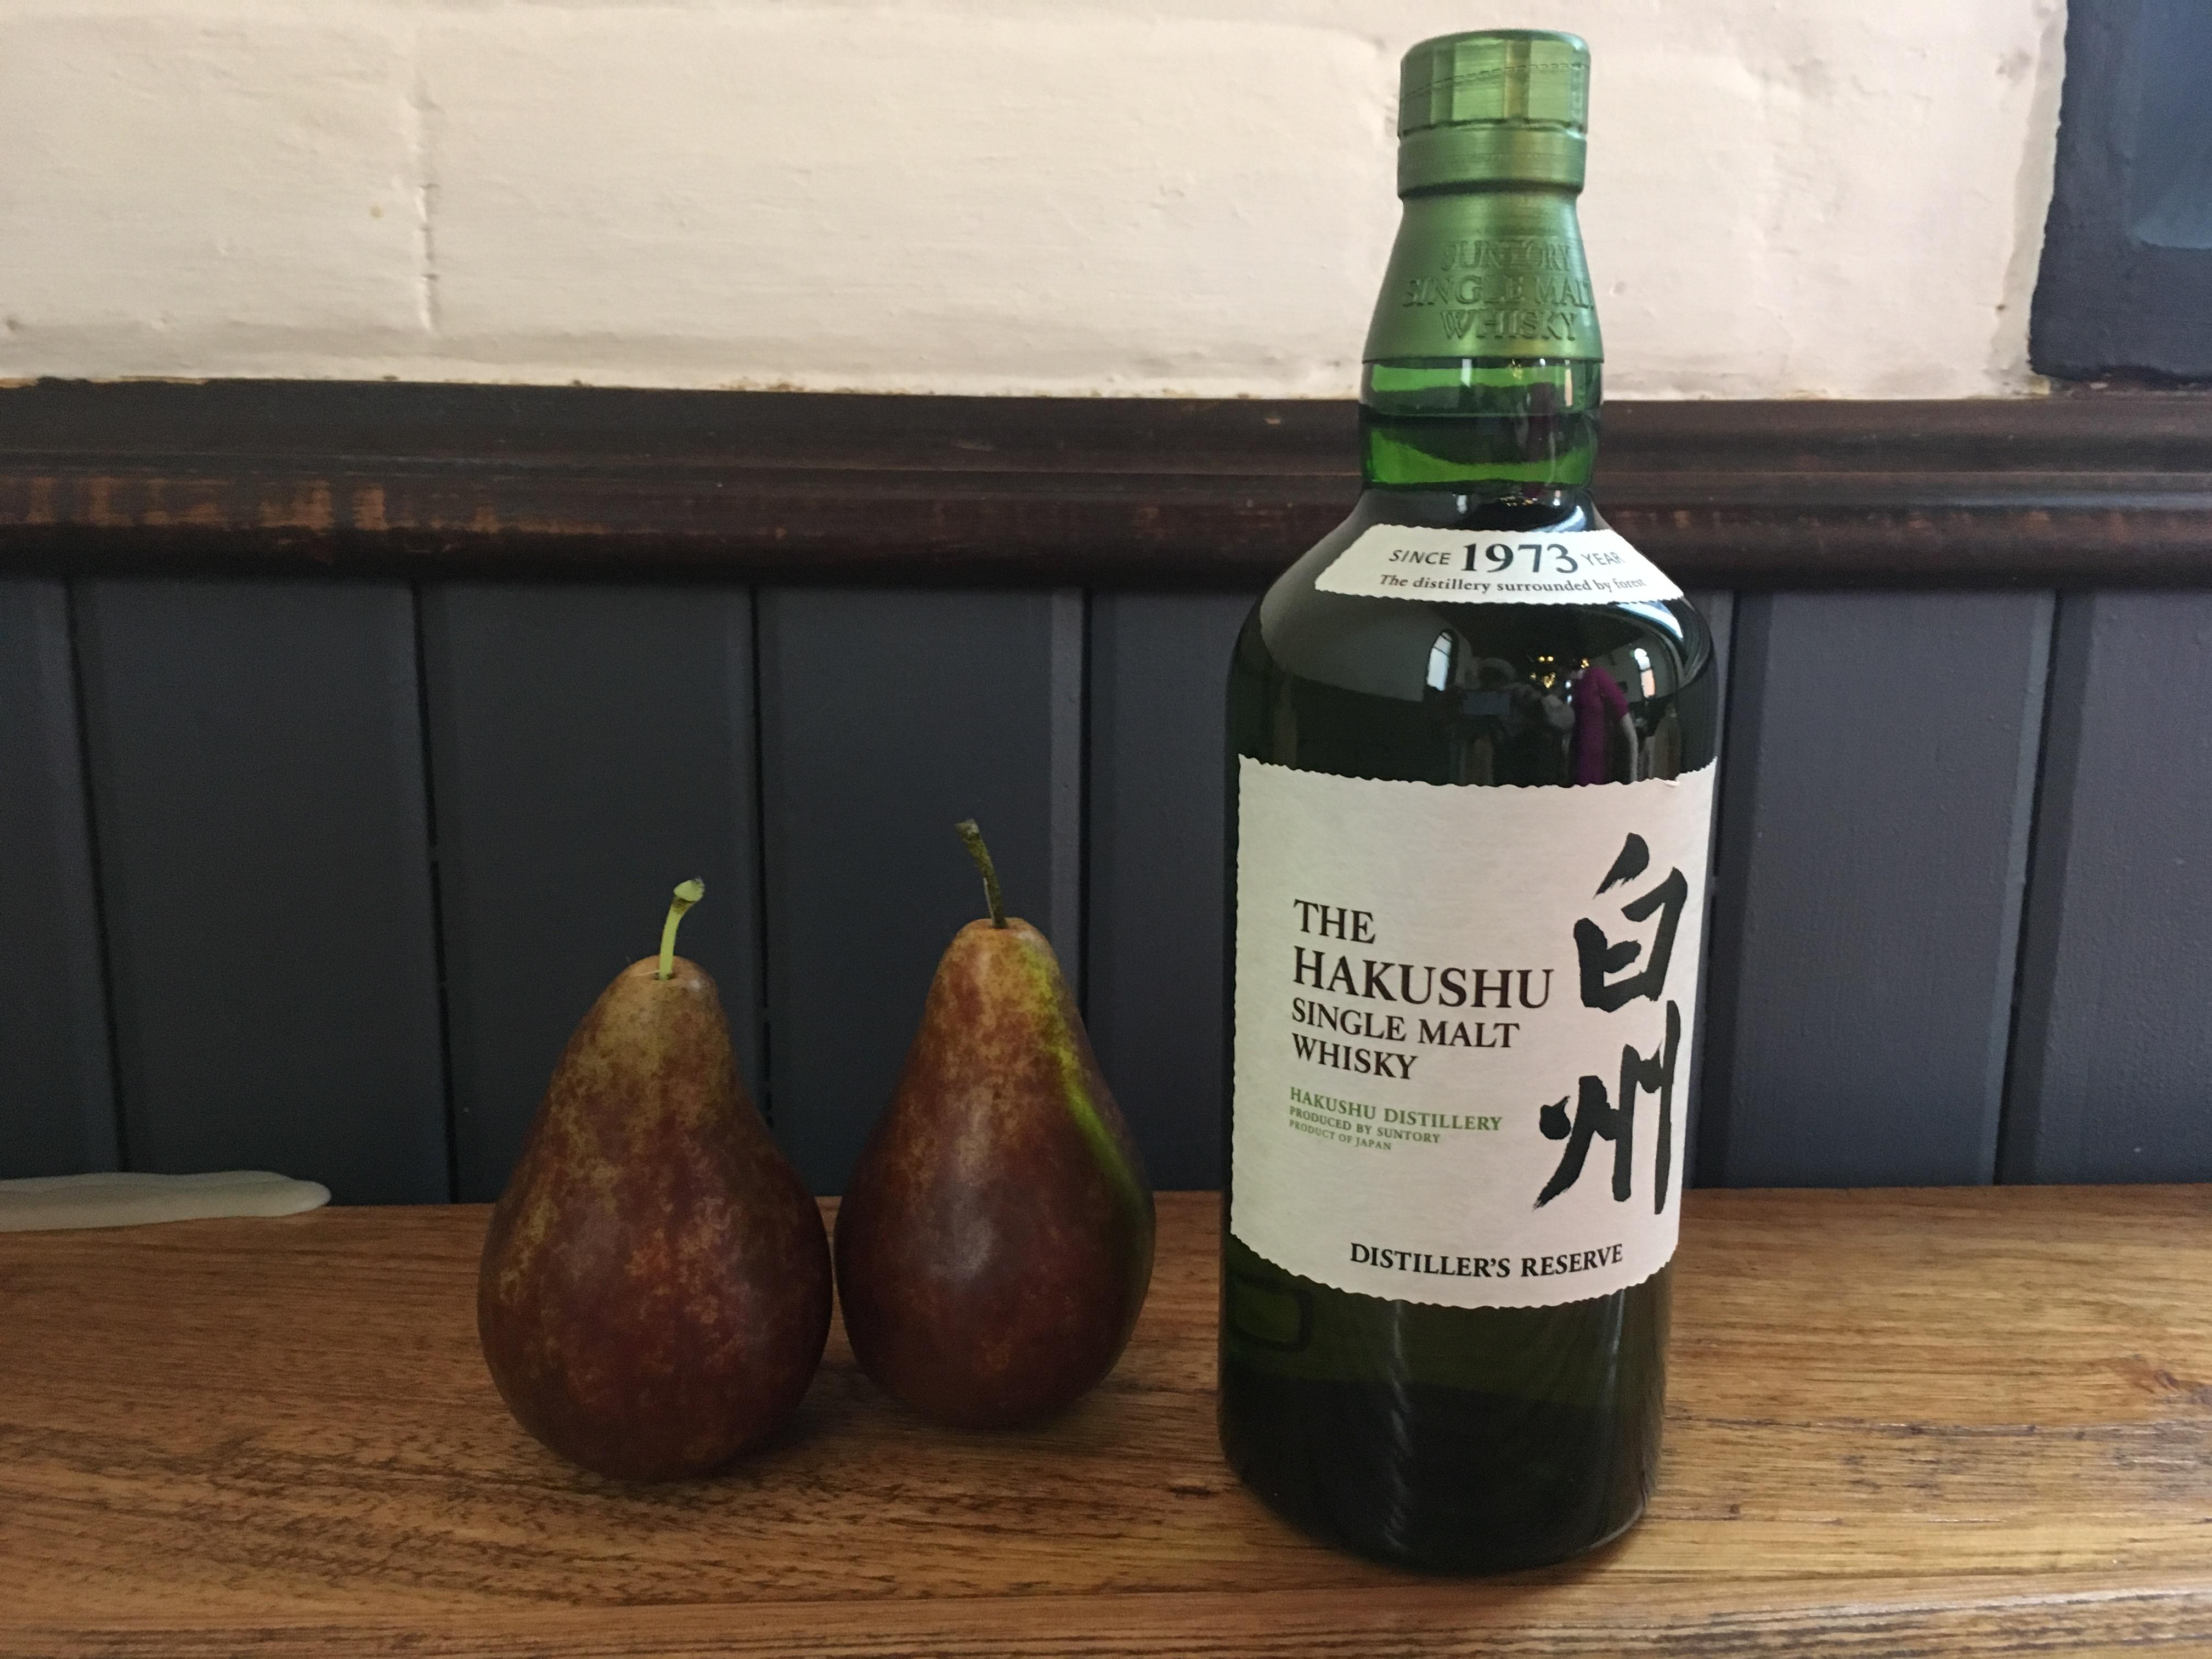 Hakushu Distillers Edition